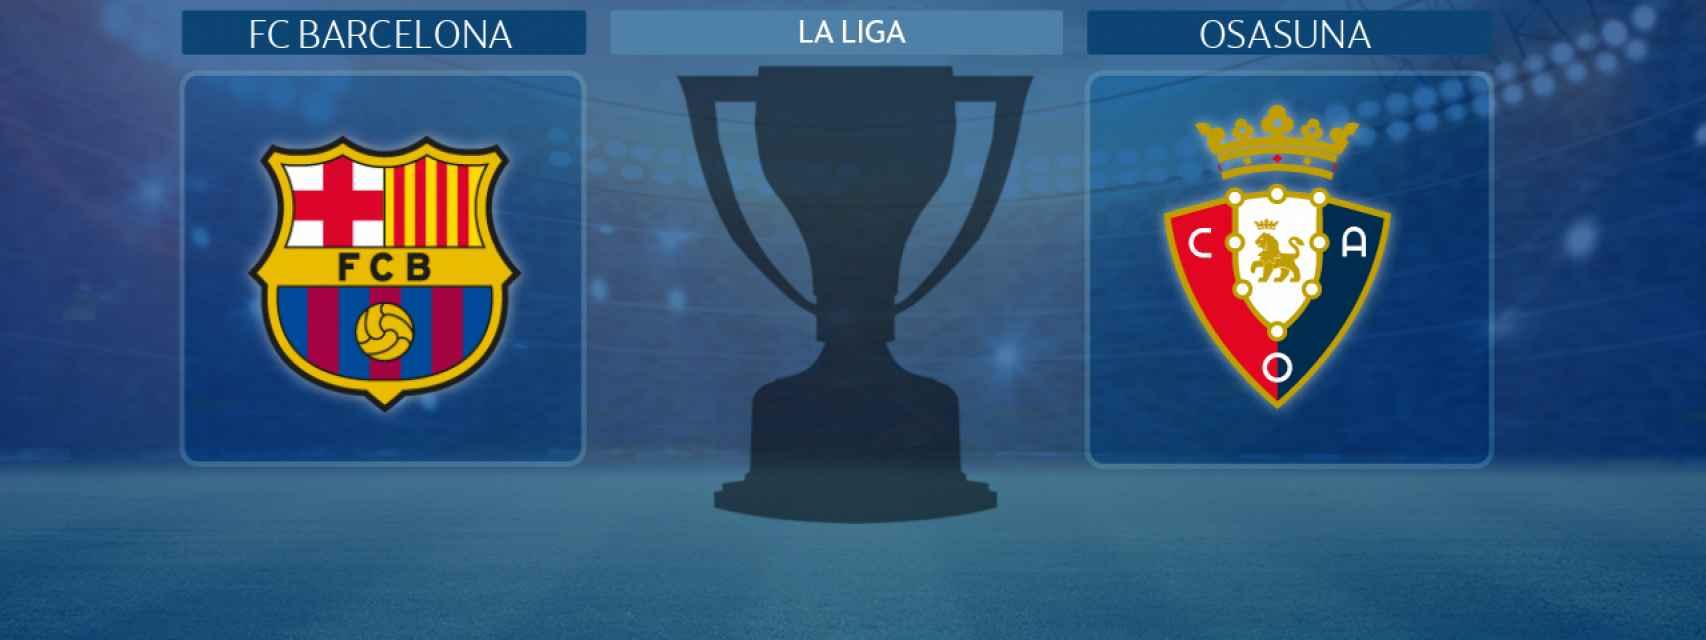 FC Barcelona - Osasuna, partido de La Liga